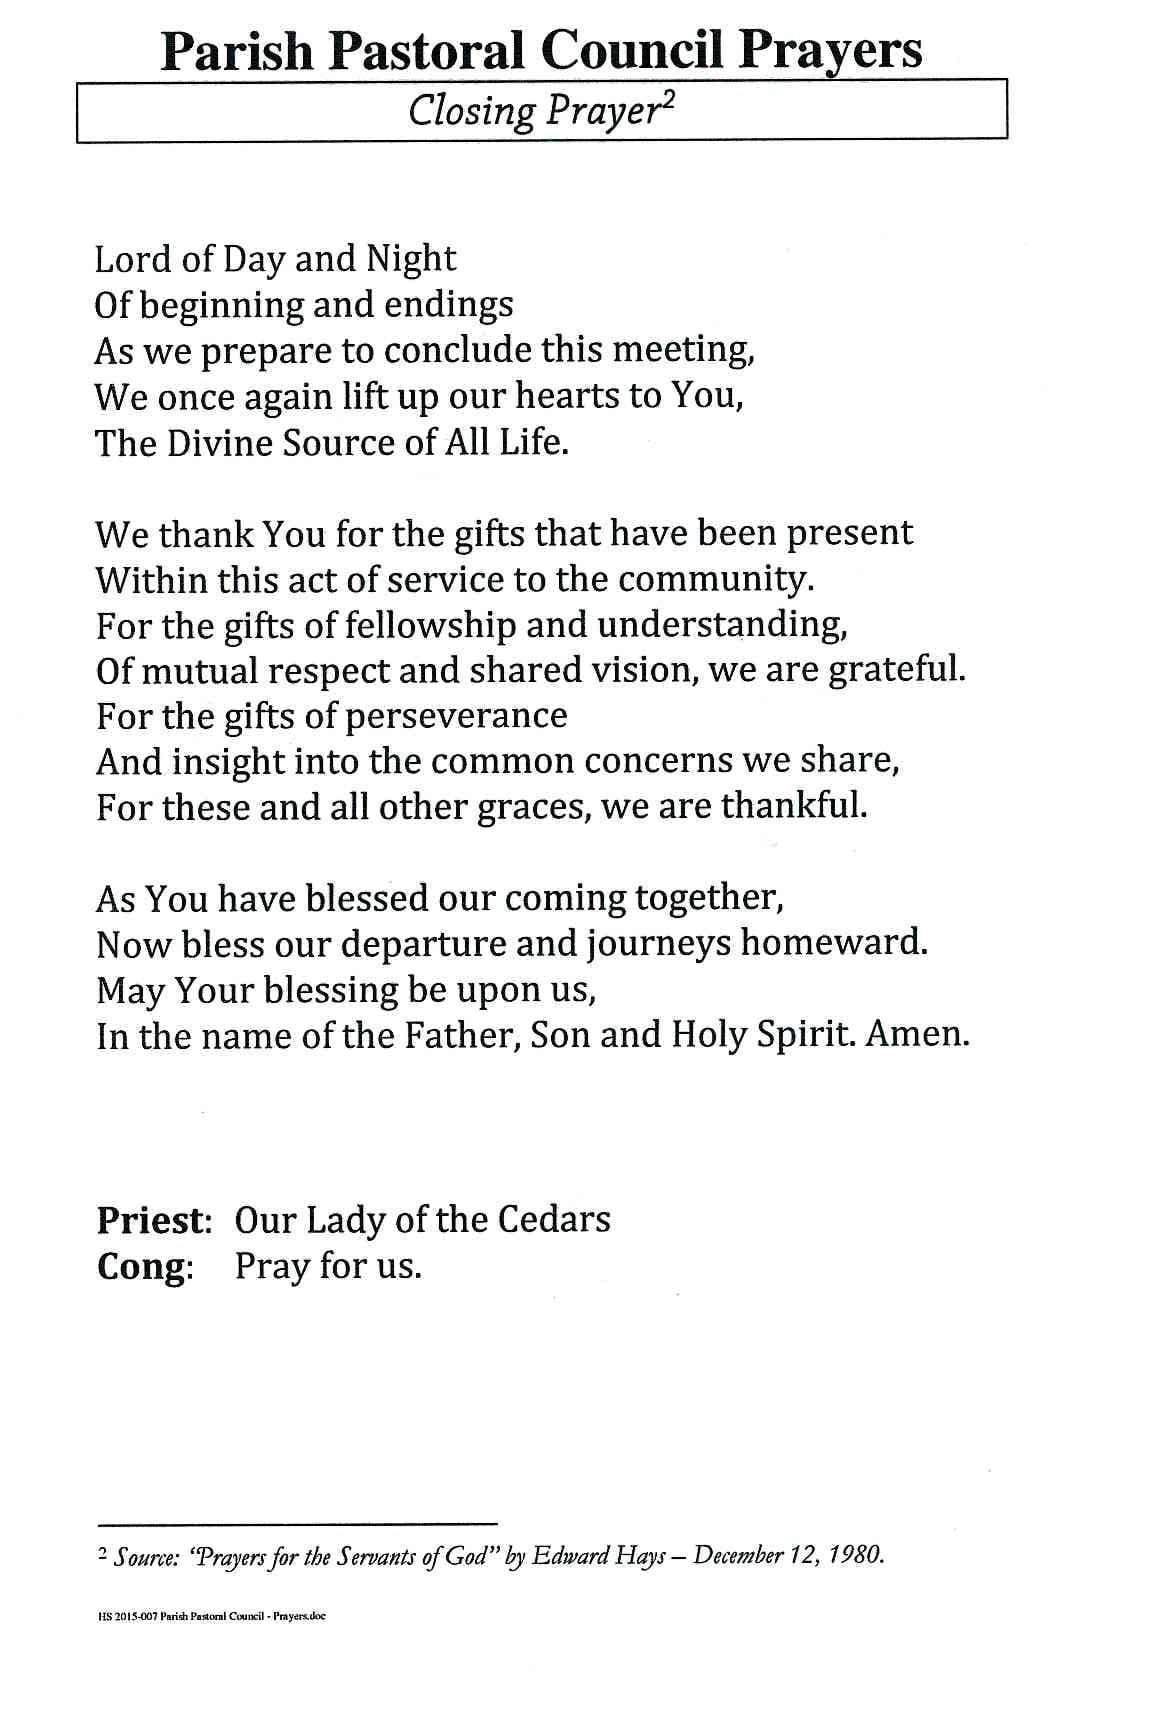 Parish Council Prayers 2015-3.jpg